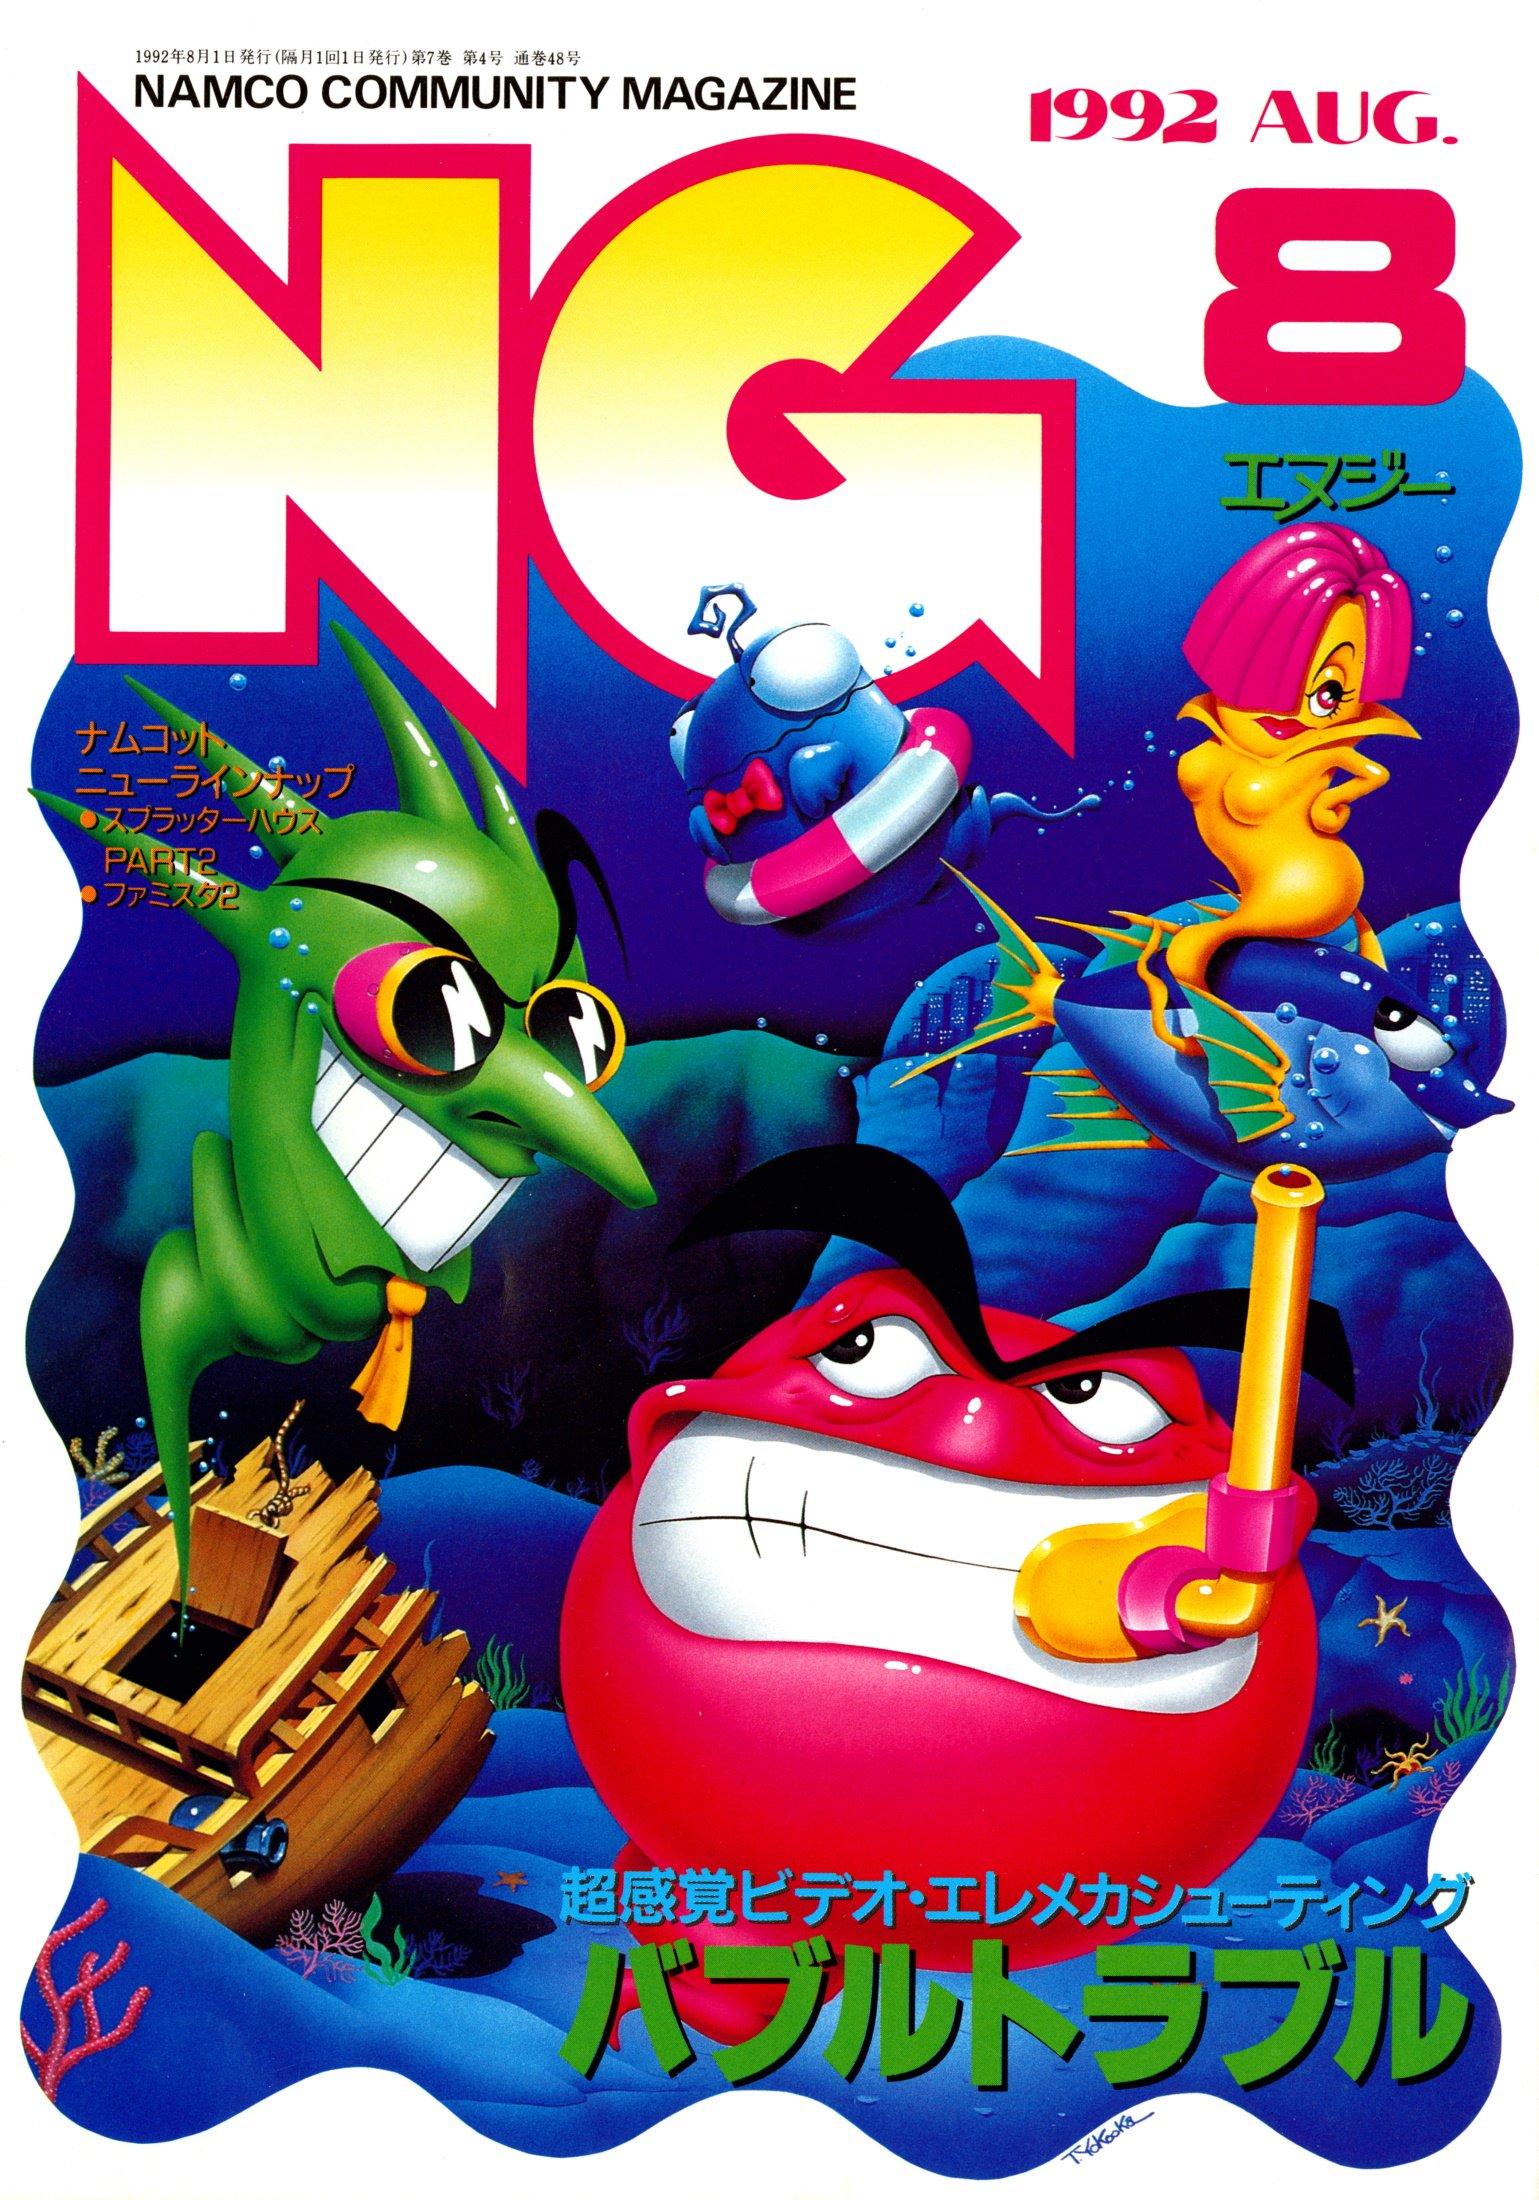 NG Namco Community Magazine Issue 48 (August 1992)